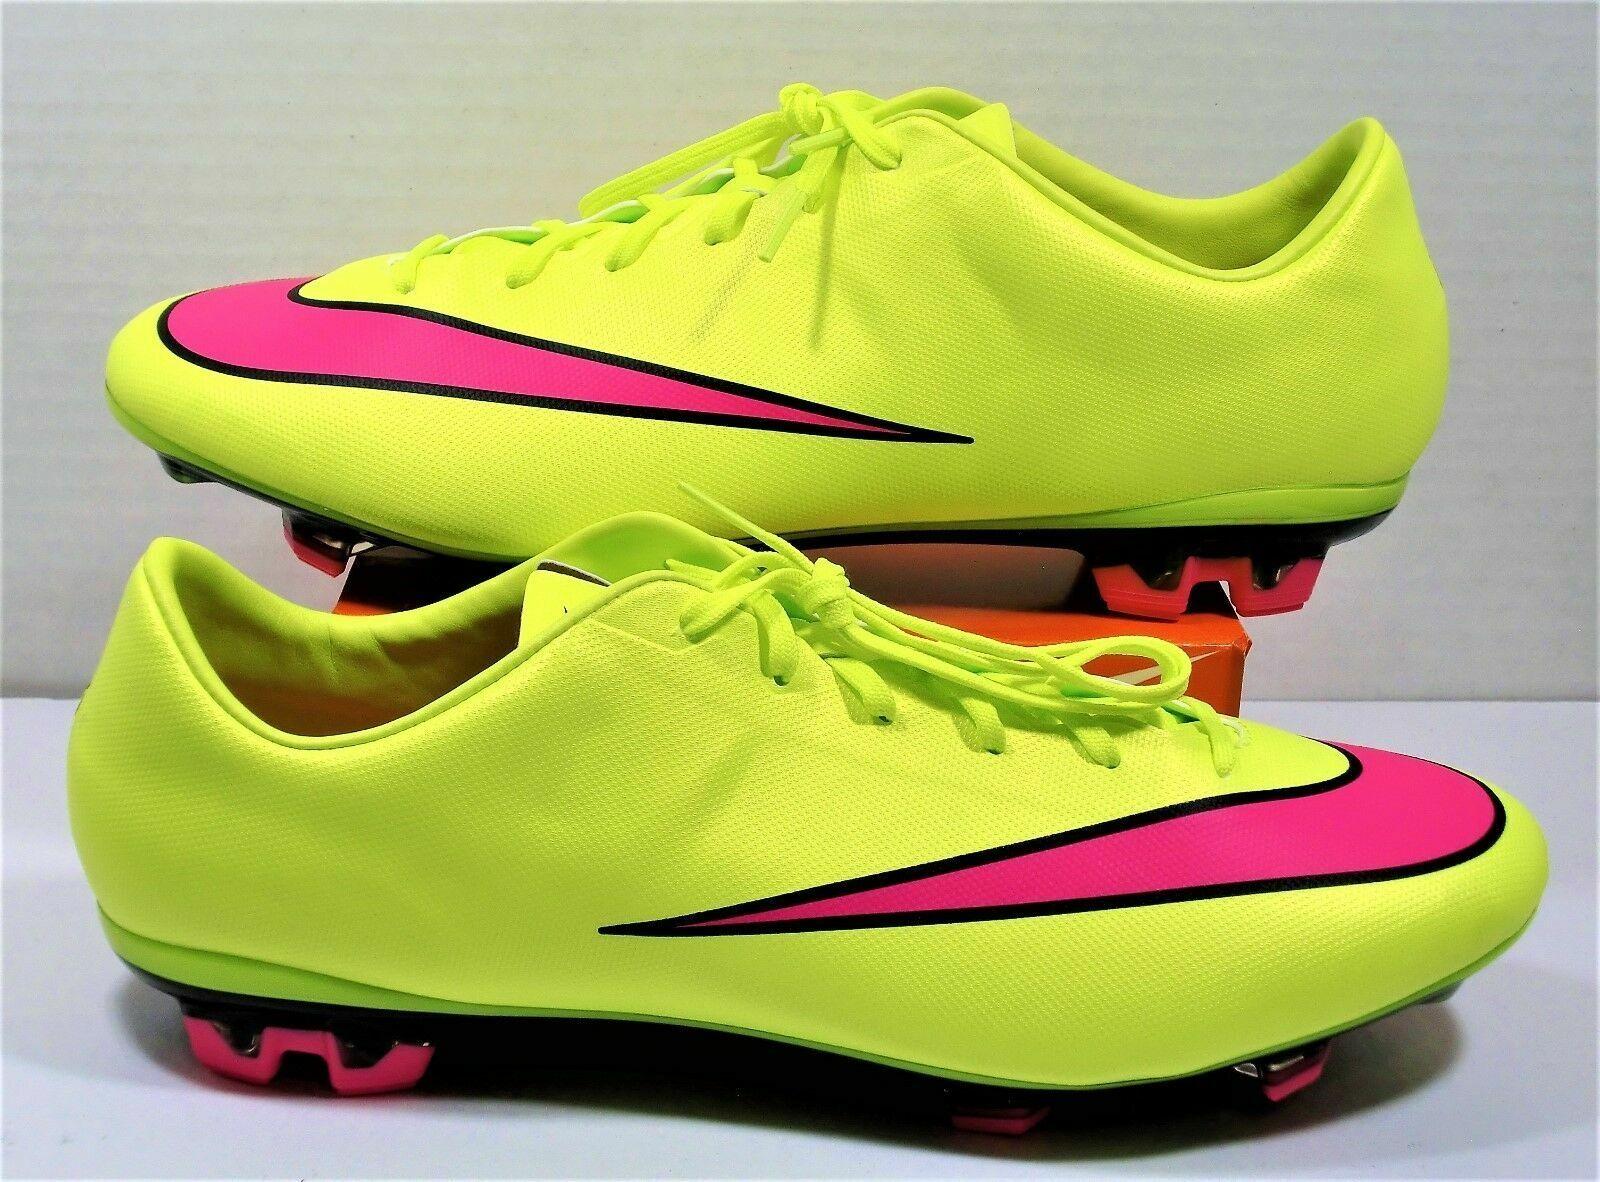 New Nike Mercurial Veloce II FG 11.5 Soccer football futbol Cleats shoes $130